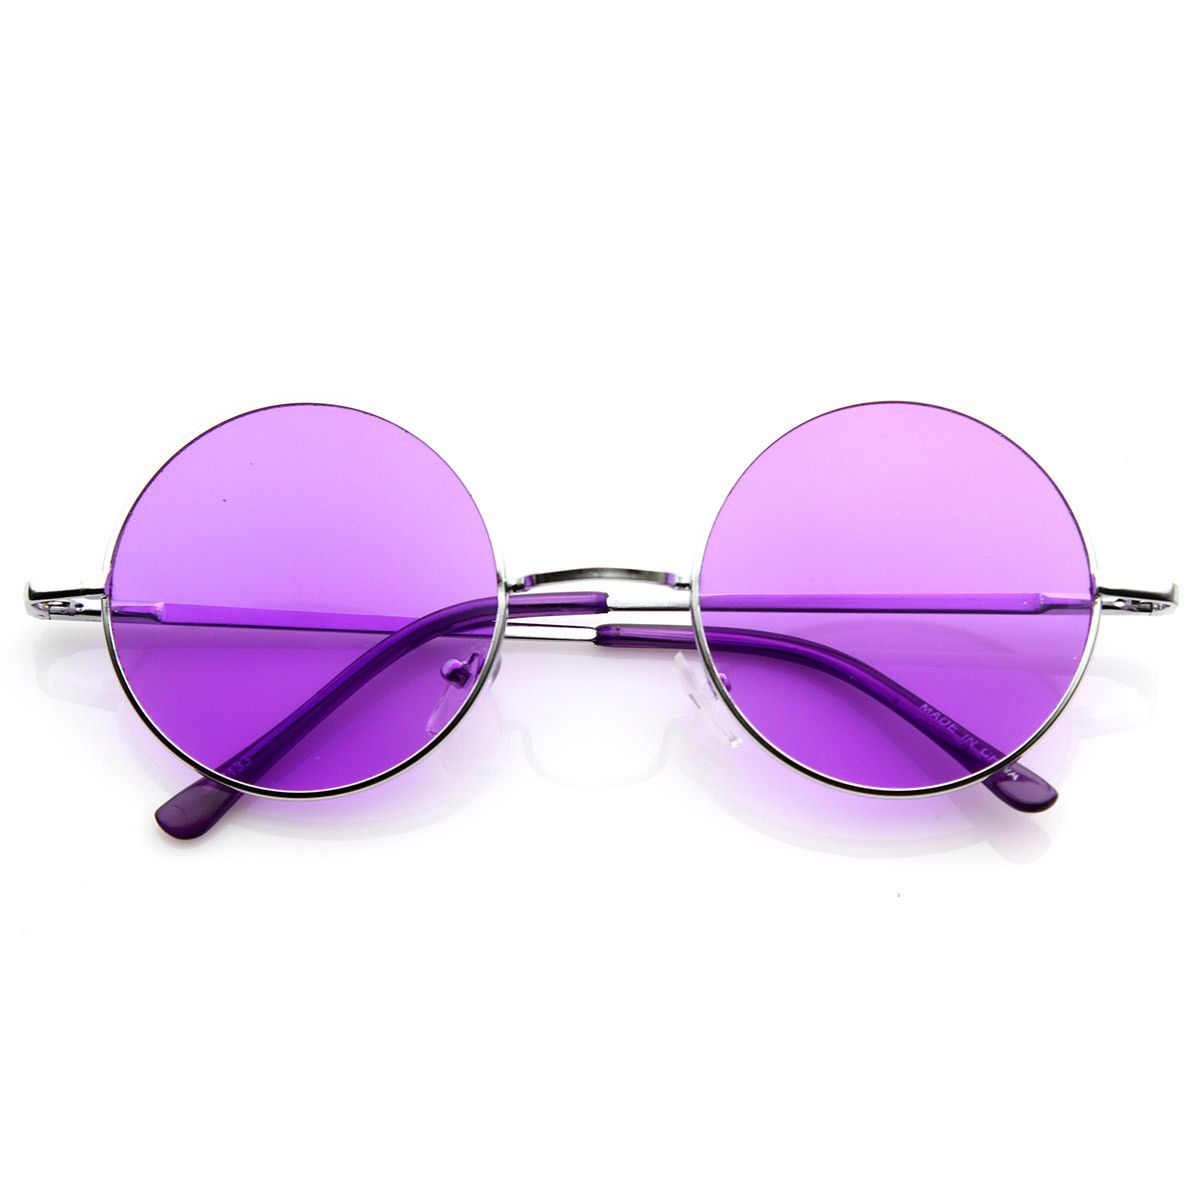 bc097d4b12 Lennon Style Round Circle Metal Sunglasses w  Color Lens Tint ...